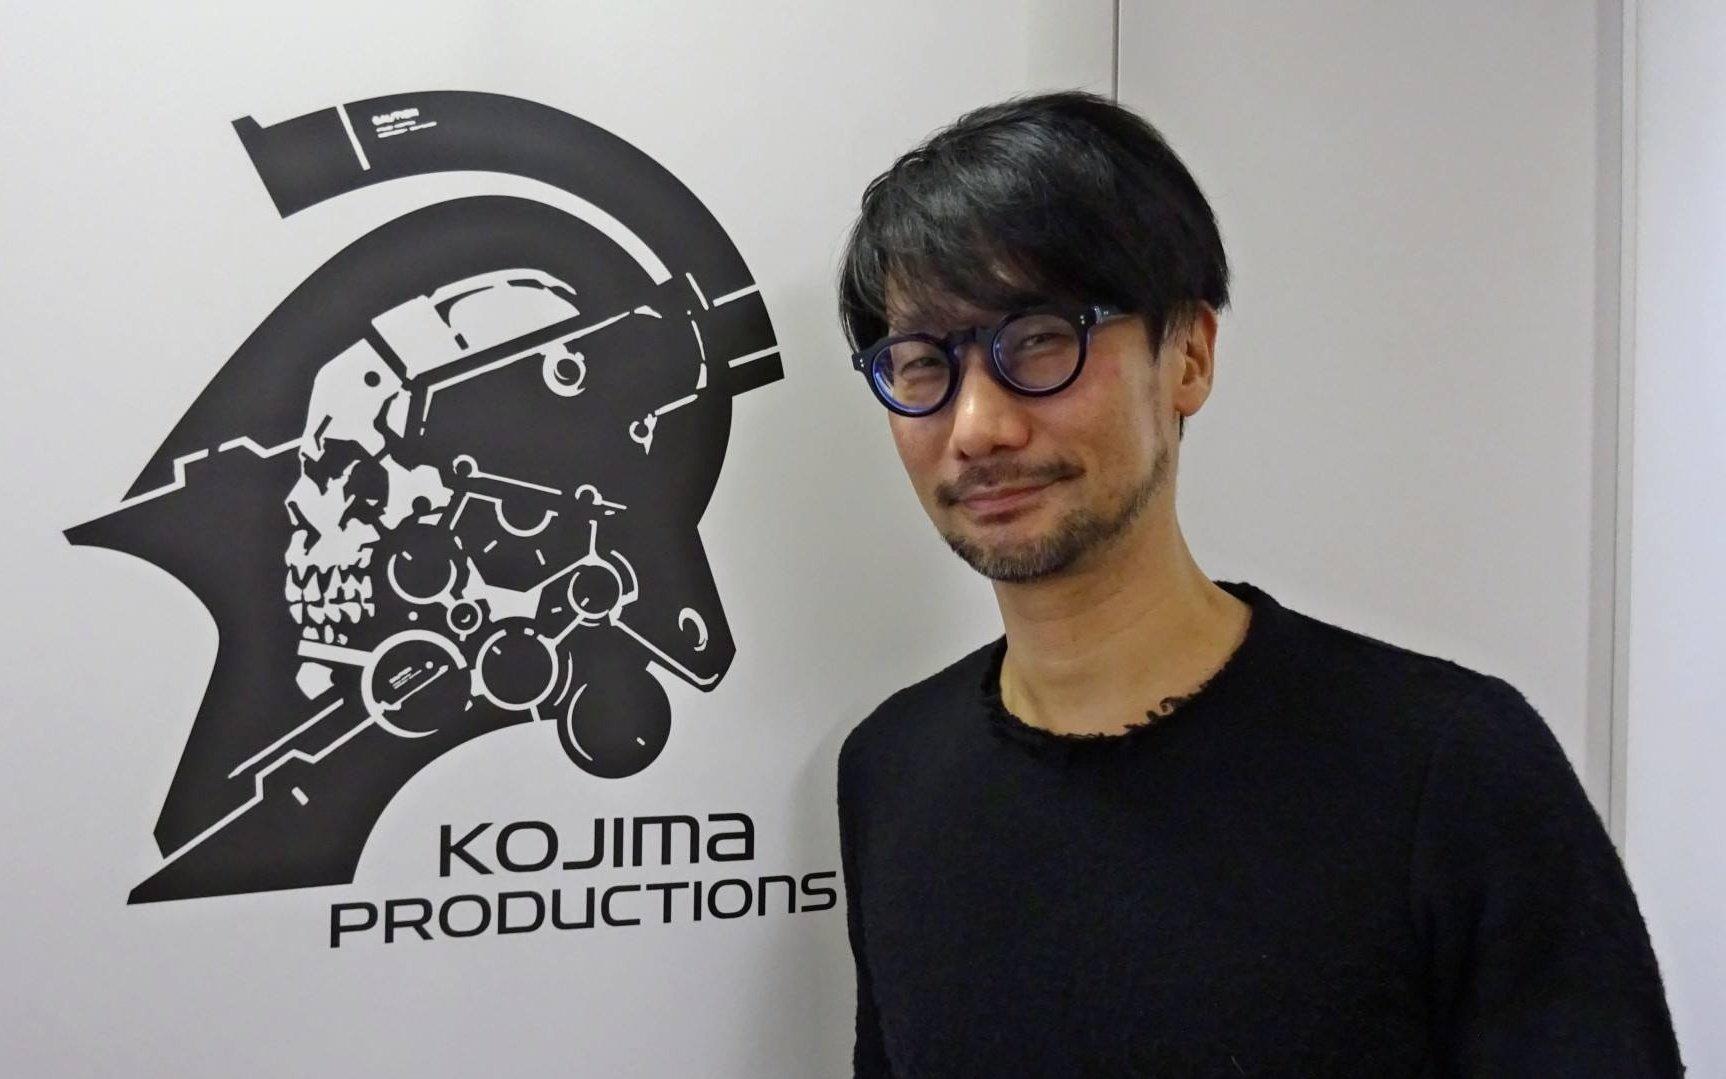 Hideo Kojima Productions